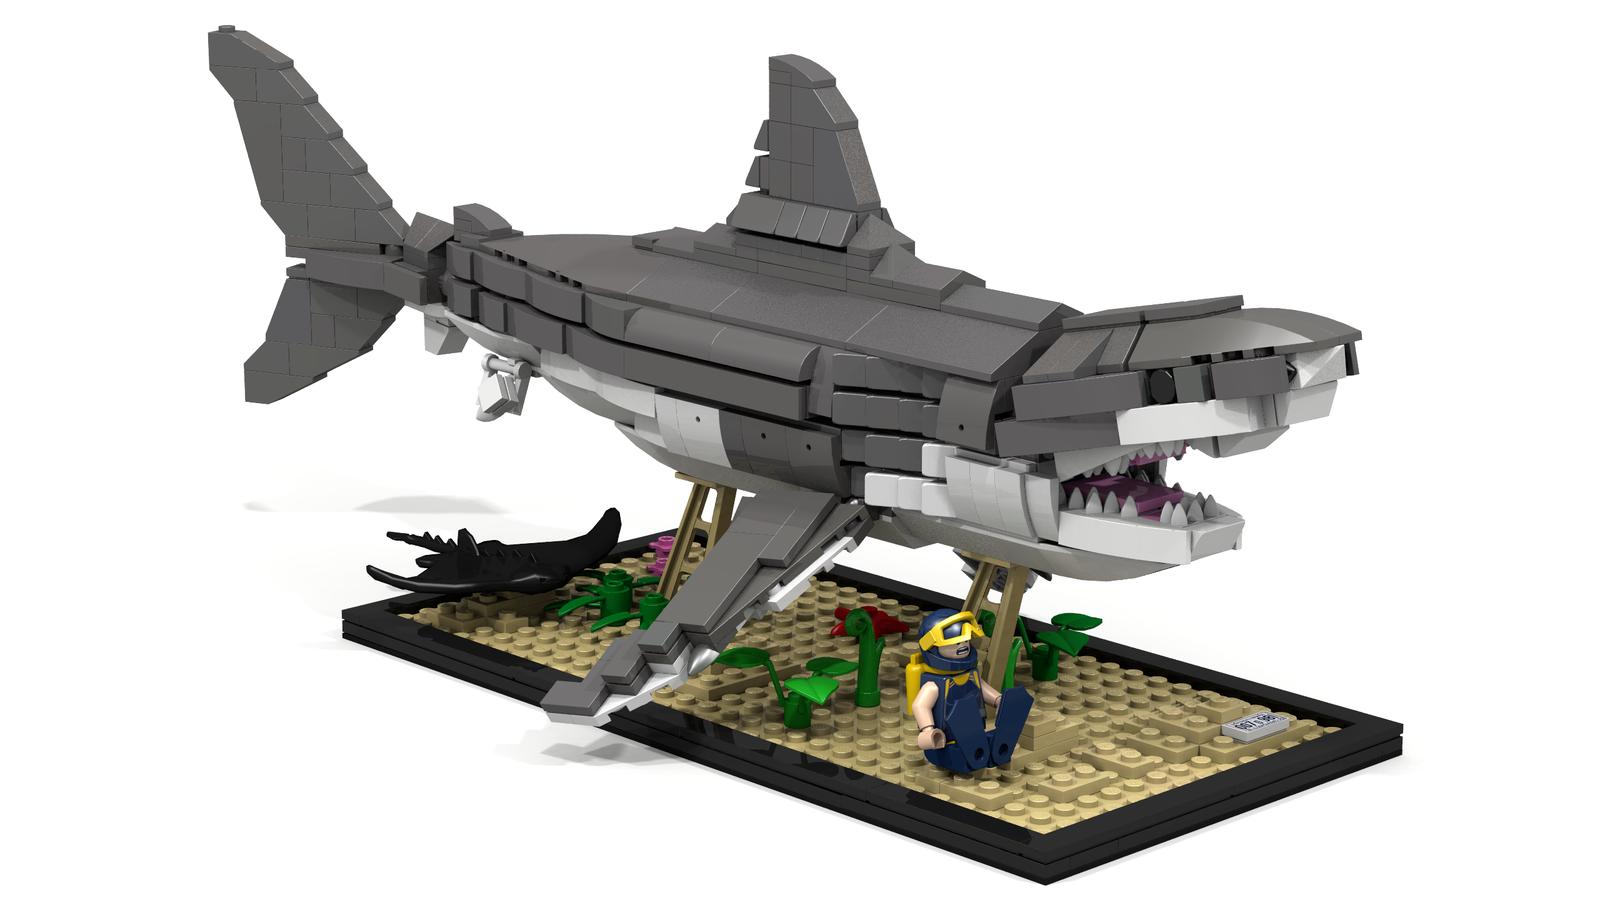 Lego Ideas Product Ideas Great White Shark